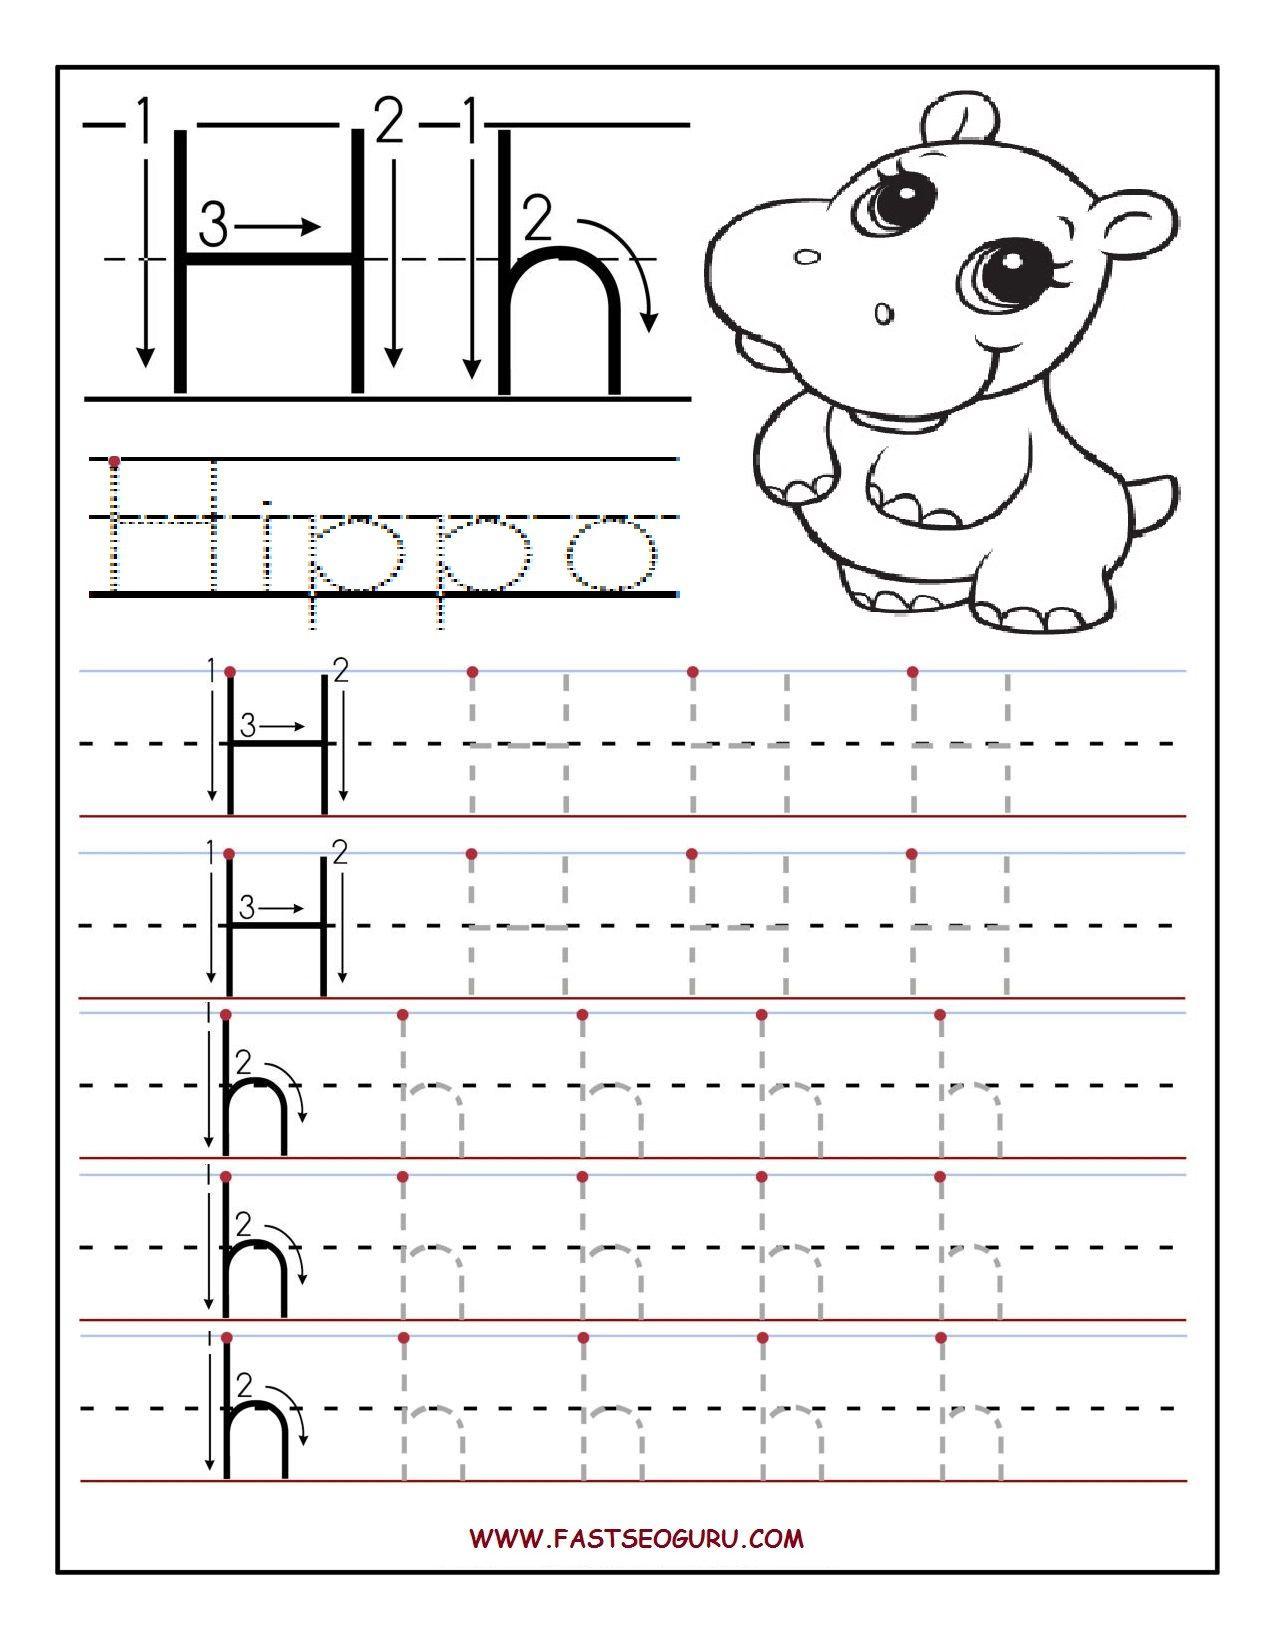 Letter H Tracing Worksheets Preschool Printable Letter H Tracing Worksheets for Preschool